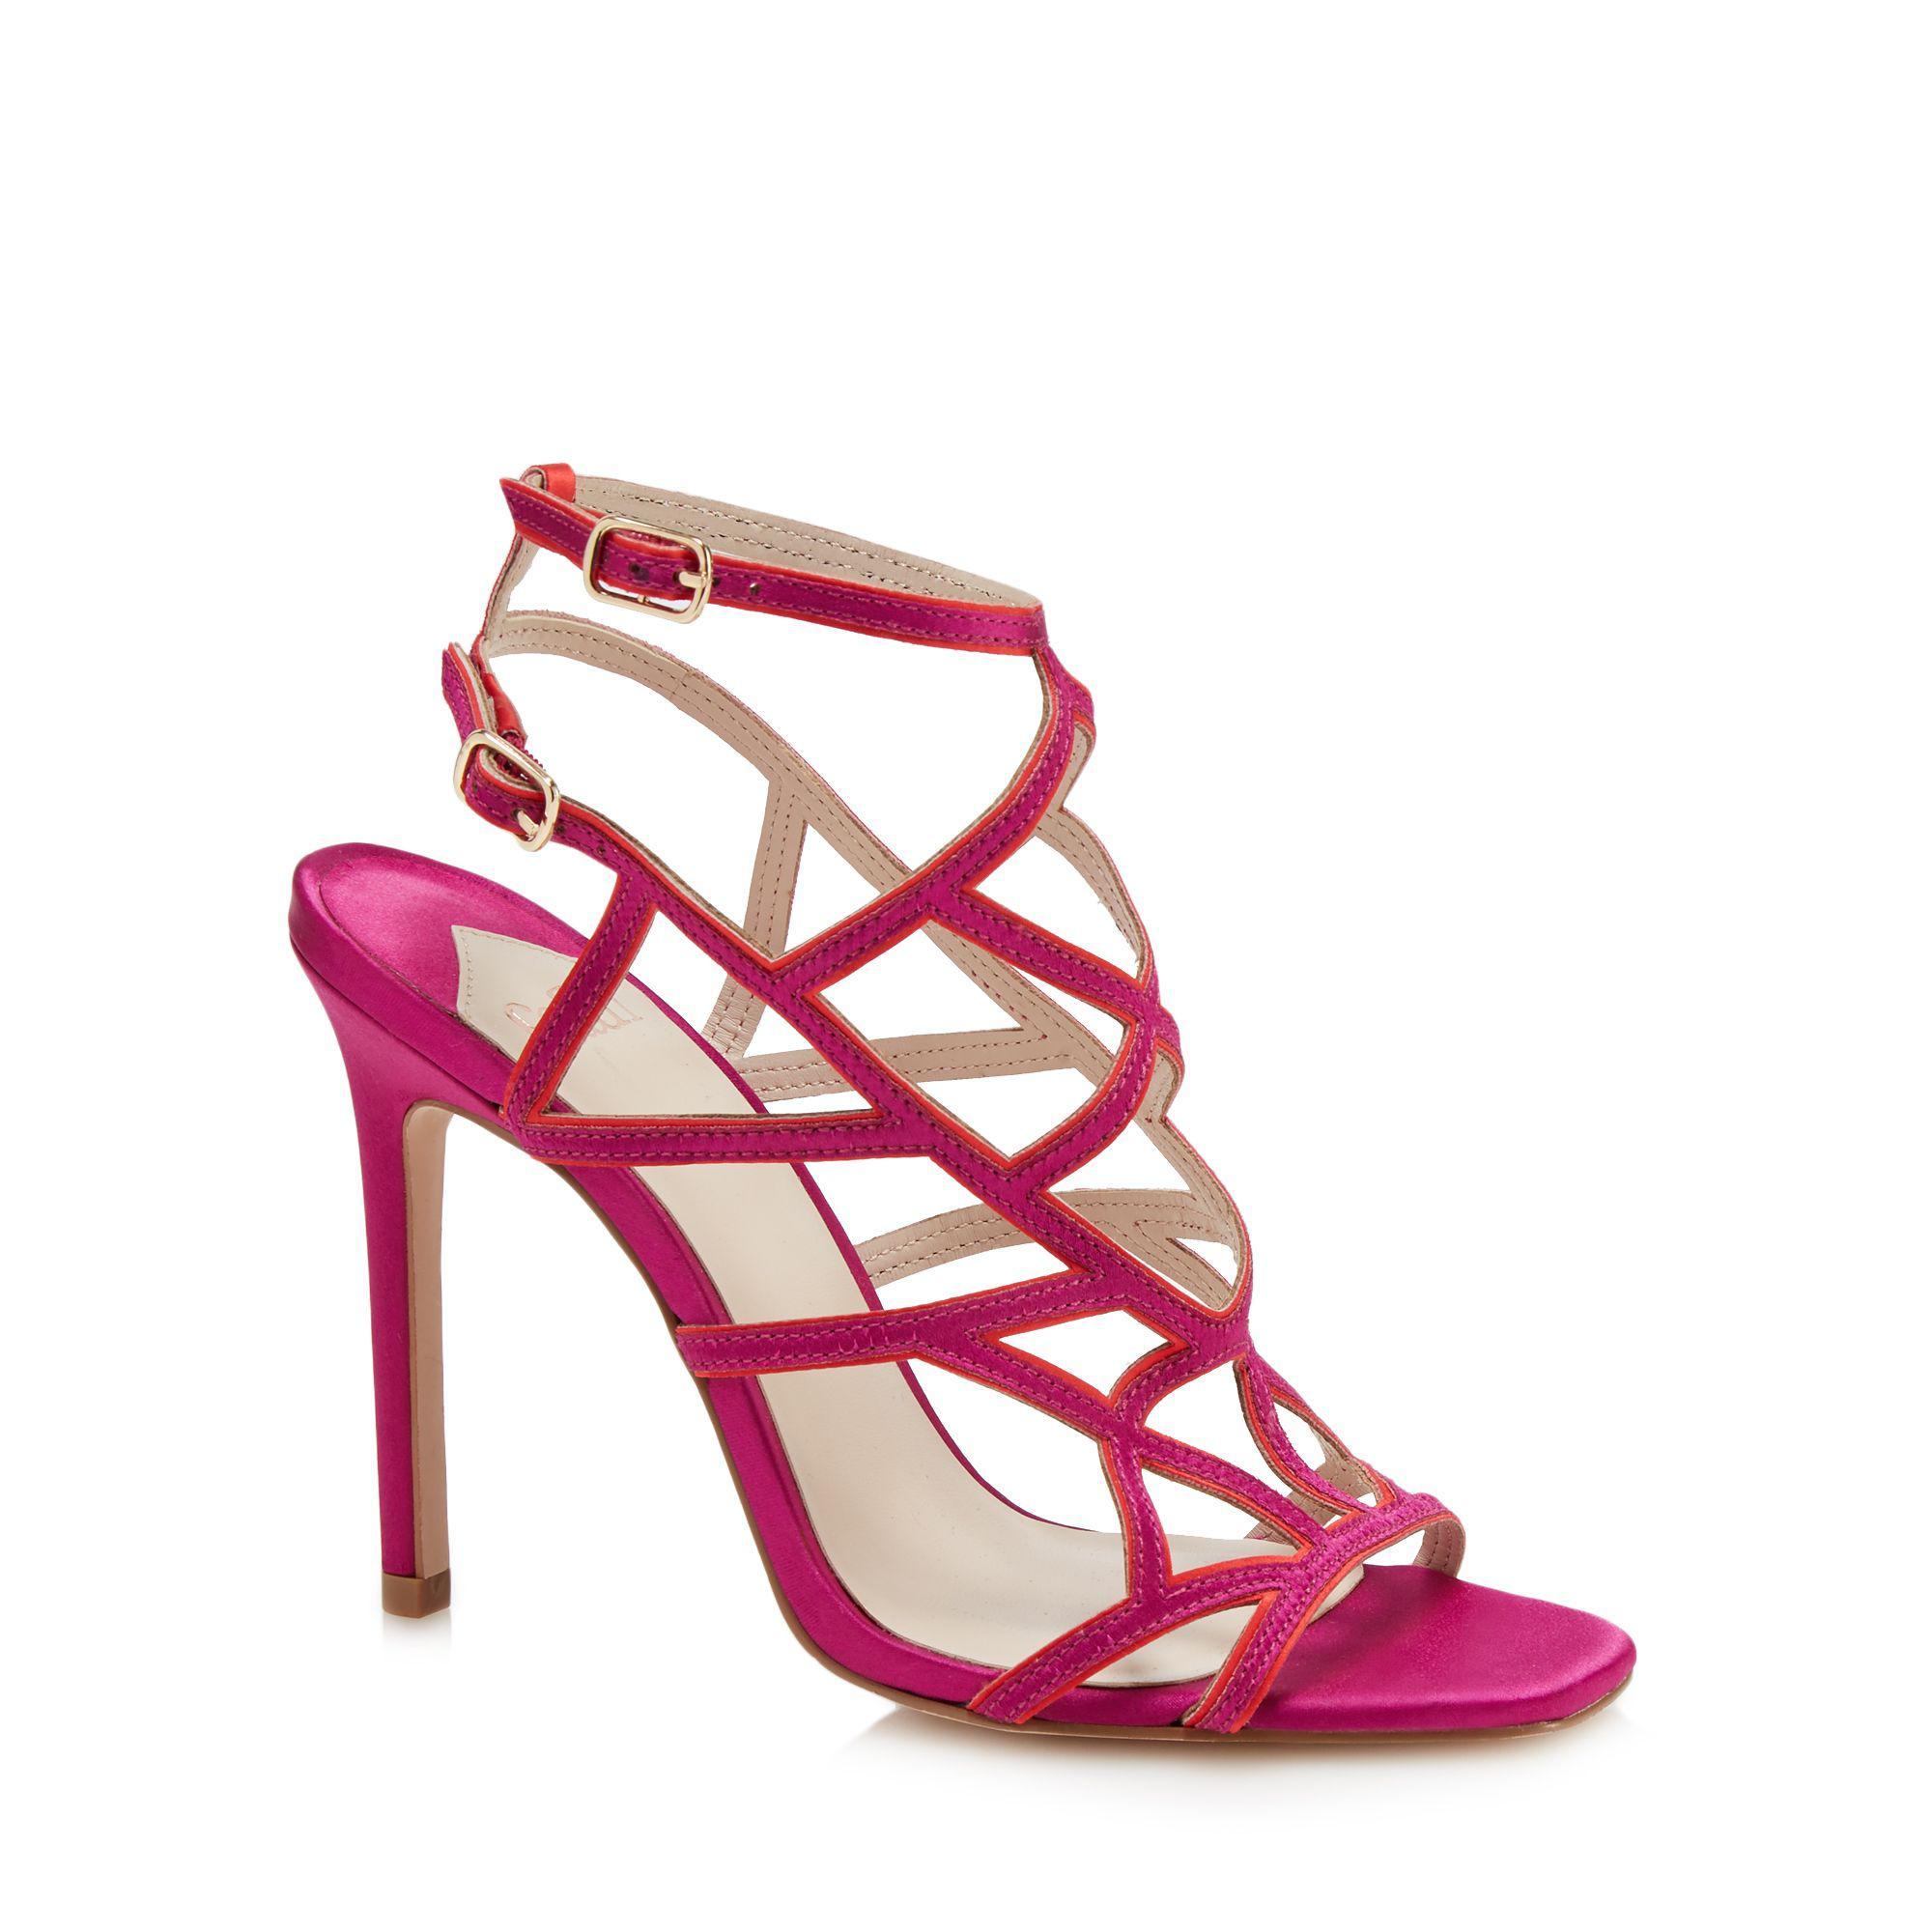 fd771115f660 Faith Pink  latoya  High Stiletto Heel Ankle Strap Sandals in Pink ...